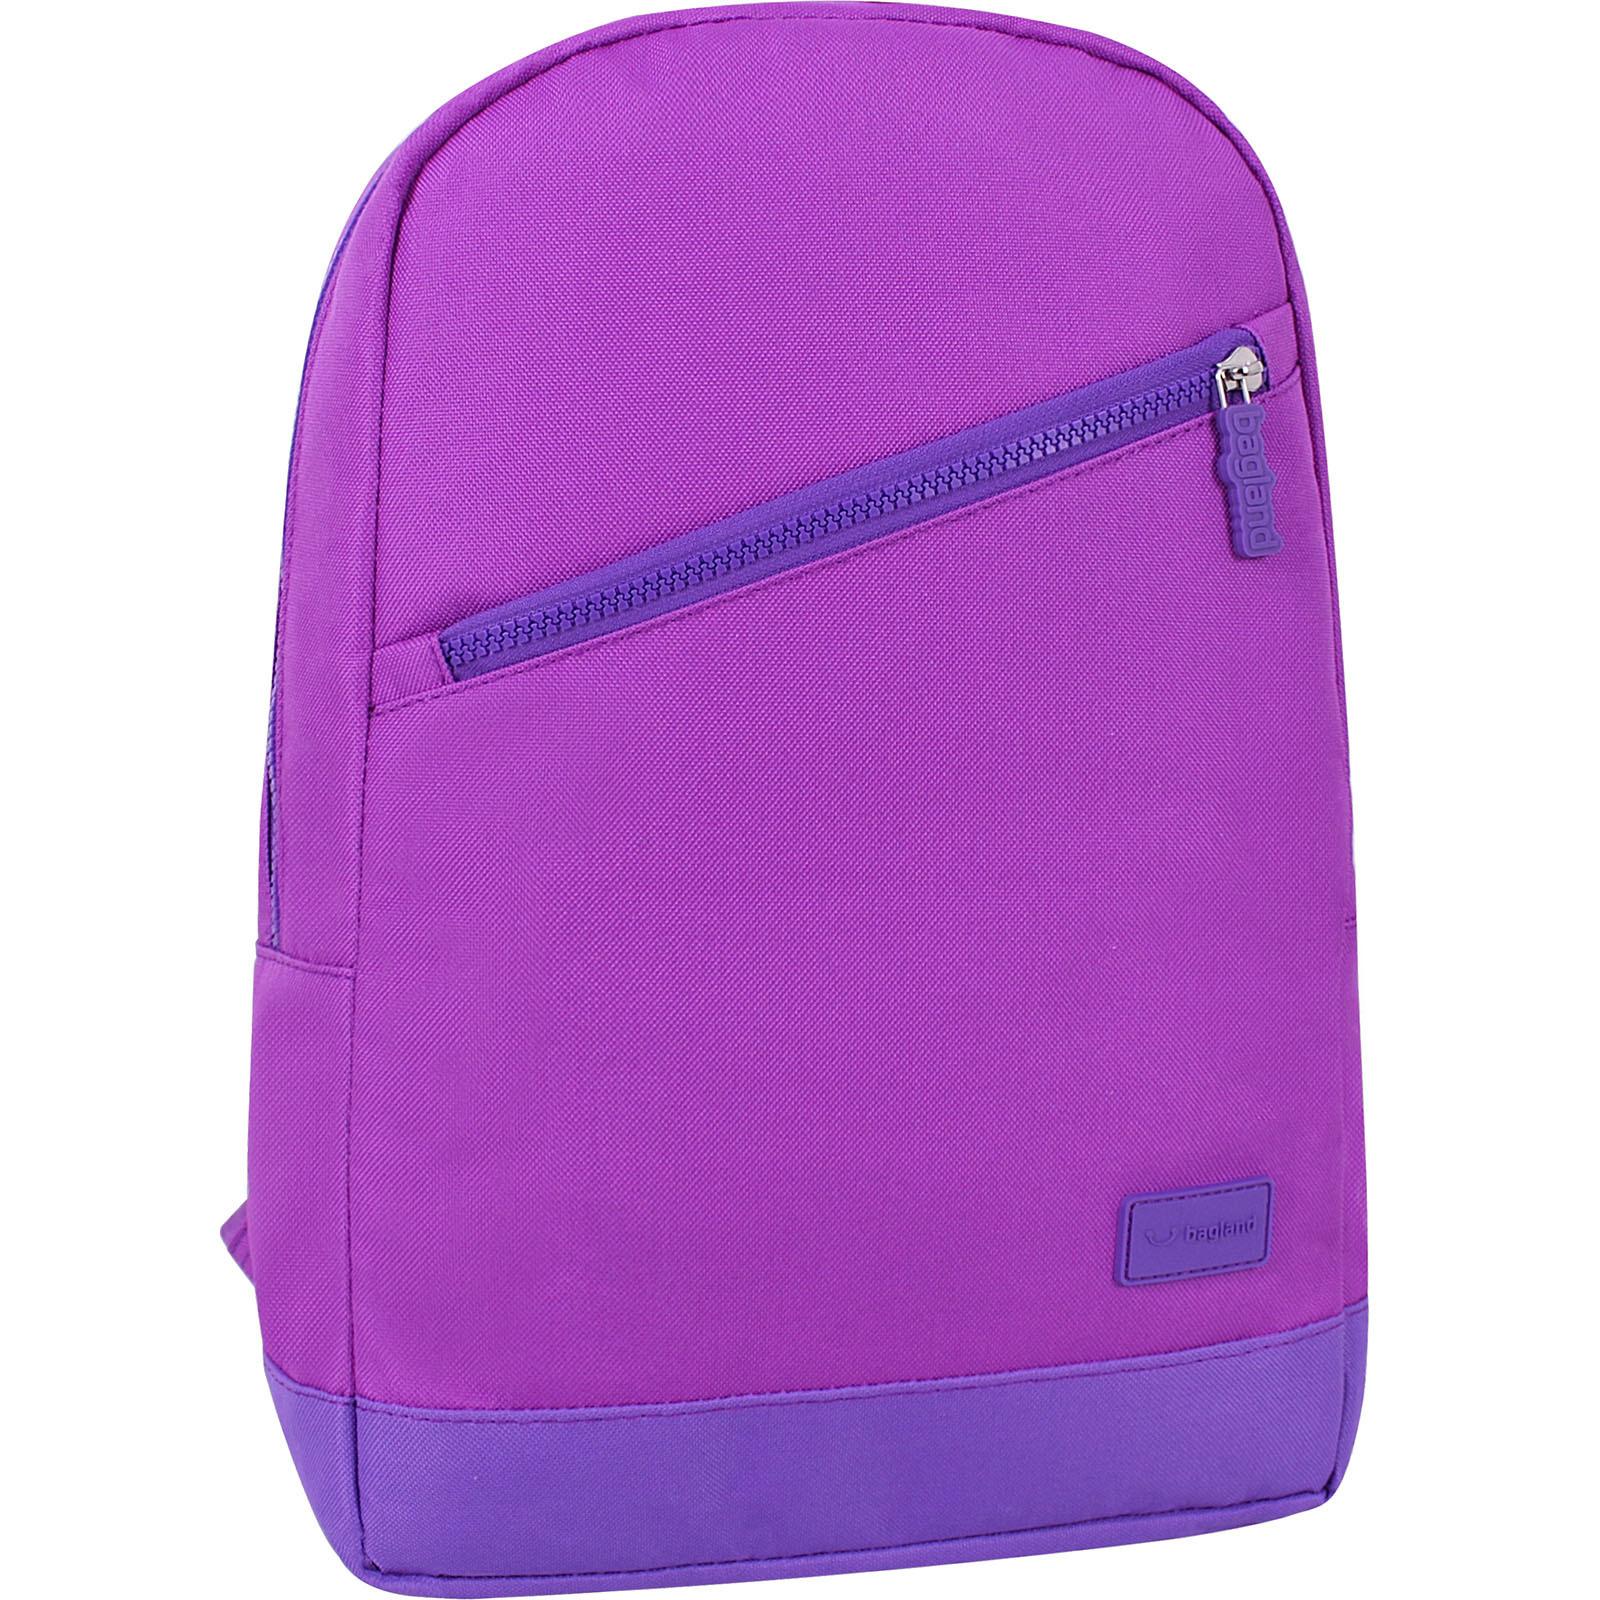 Городские рюкзаки Рюкзак Bagland Amber 15 л. 339 фиолетовый/бузок (0010466) IMG_9774_339.170_.JPG